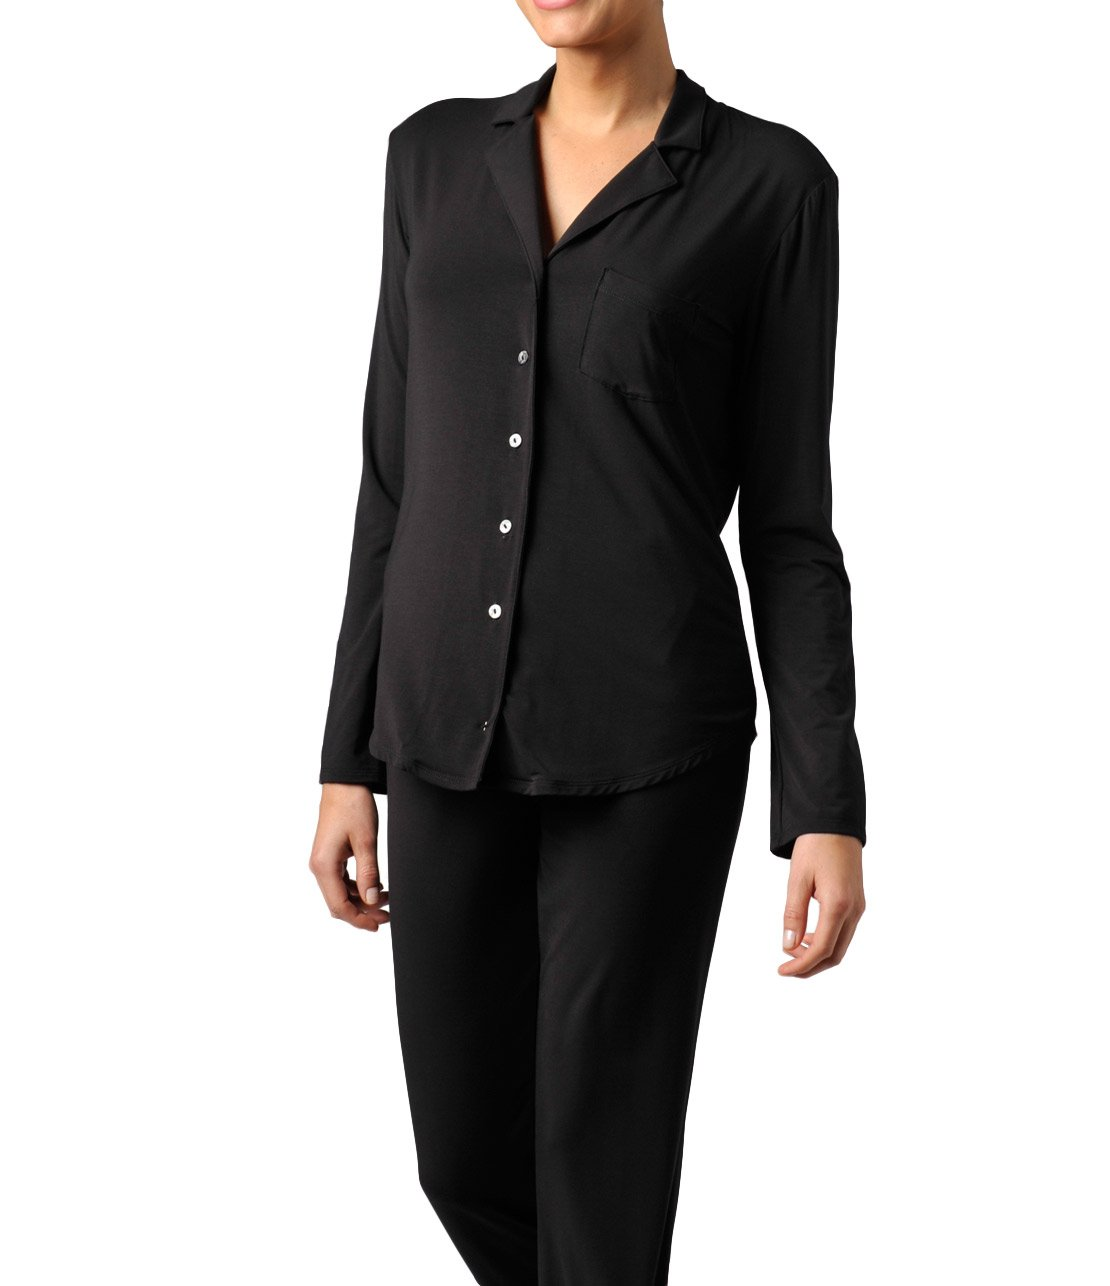 Naked Women's MicroModal Luxury Pajama Set - Sleepwear & Loungewear For Women - Black, Large by Naked